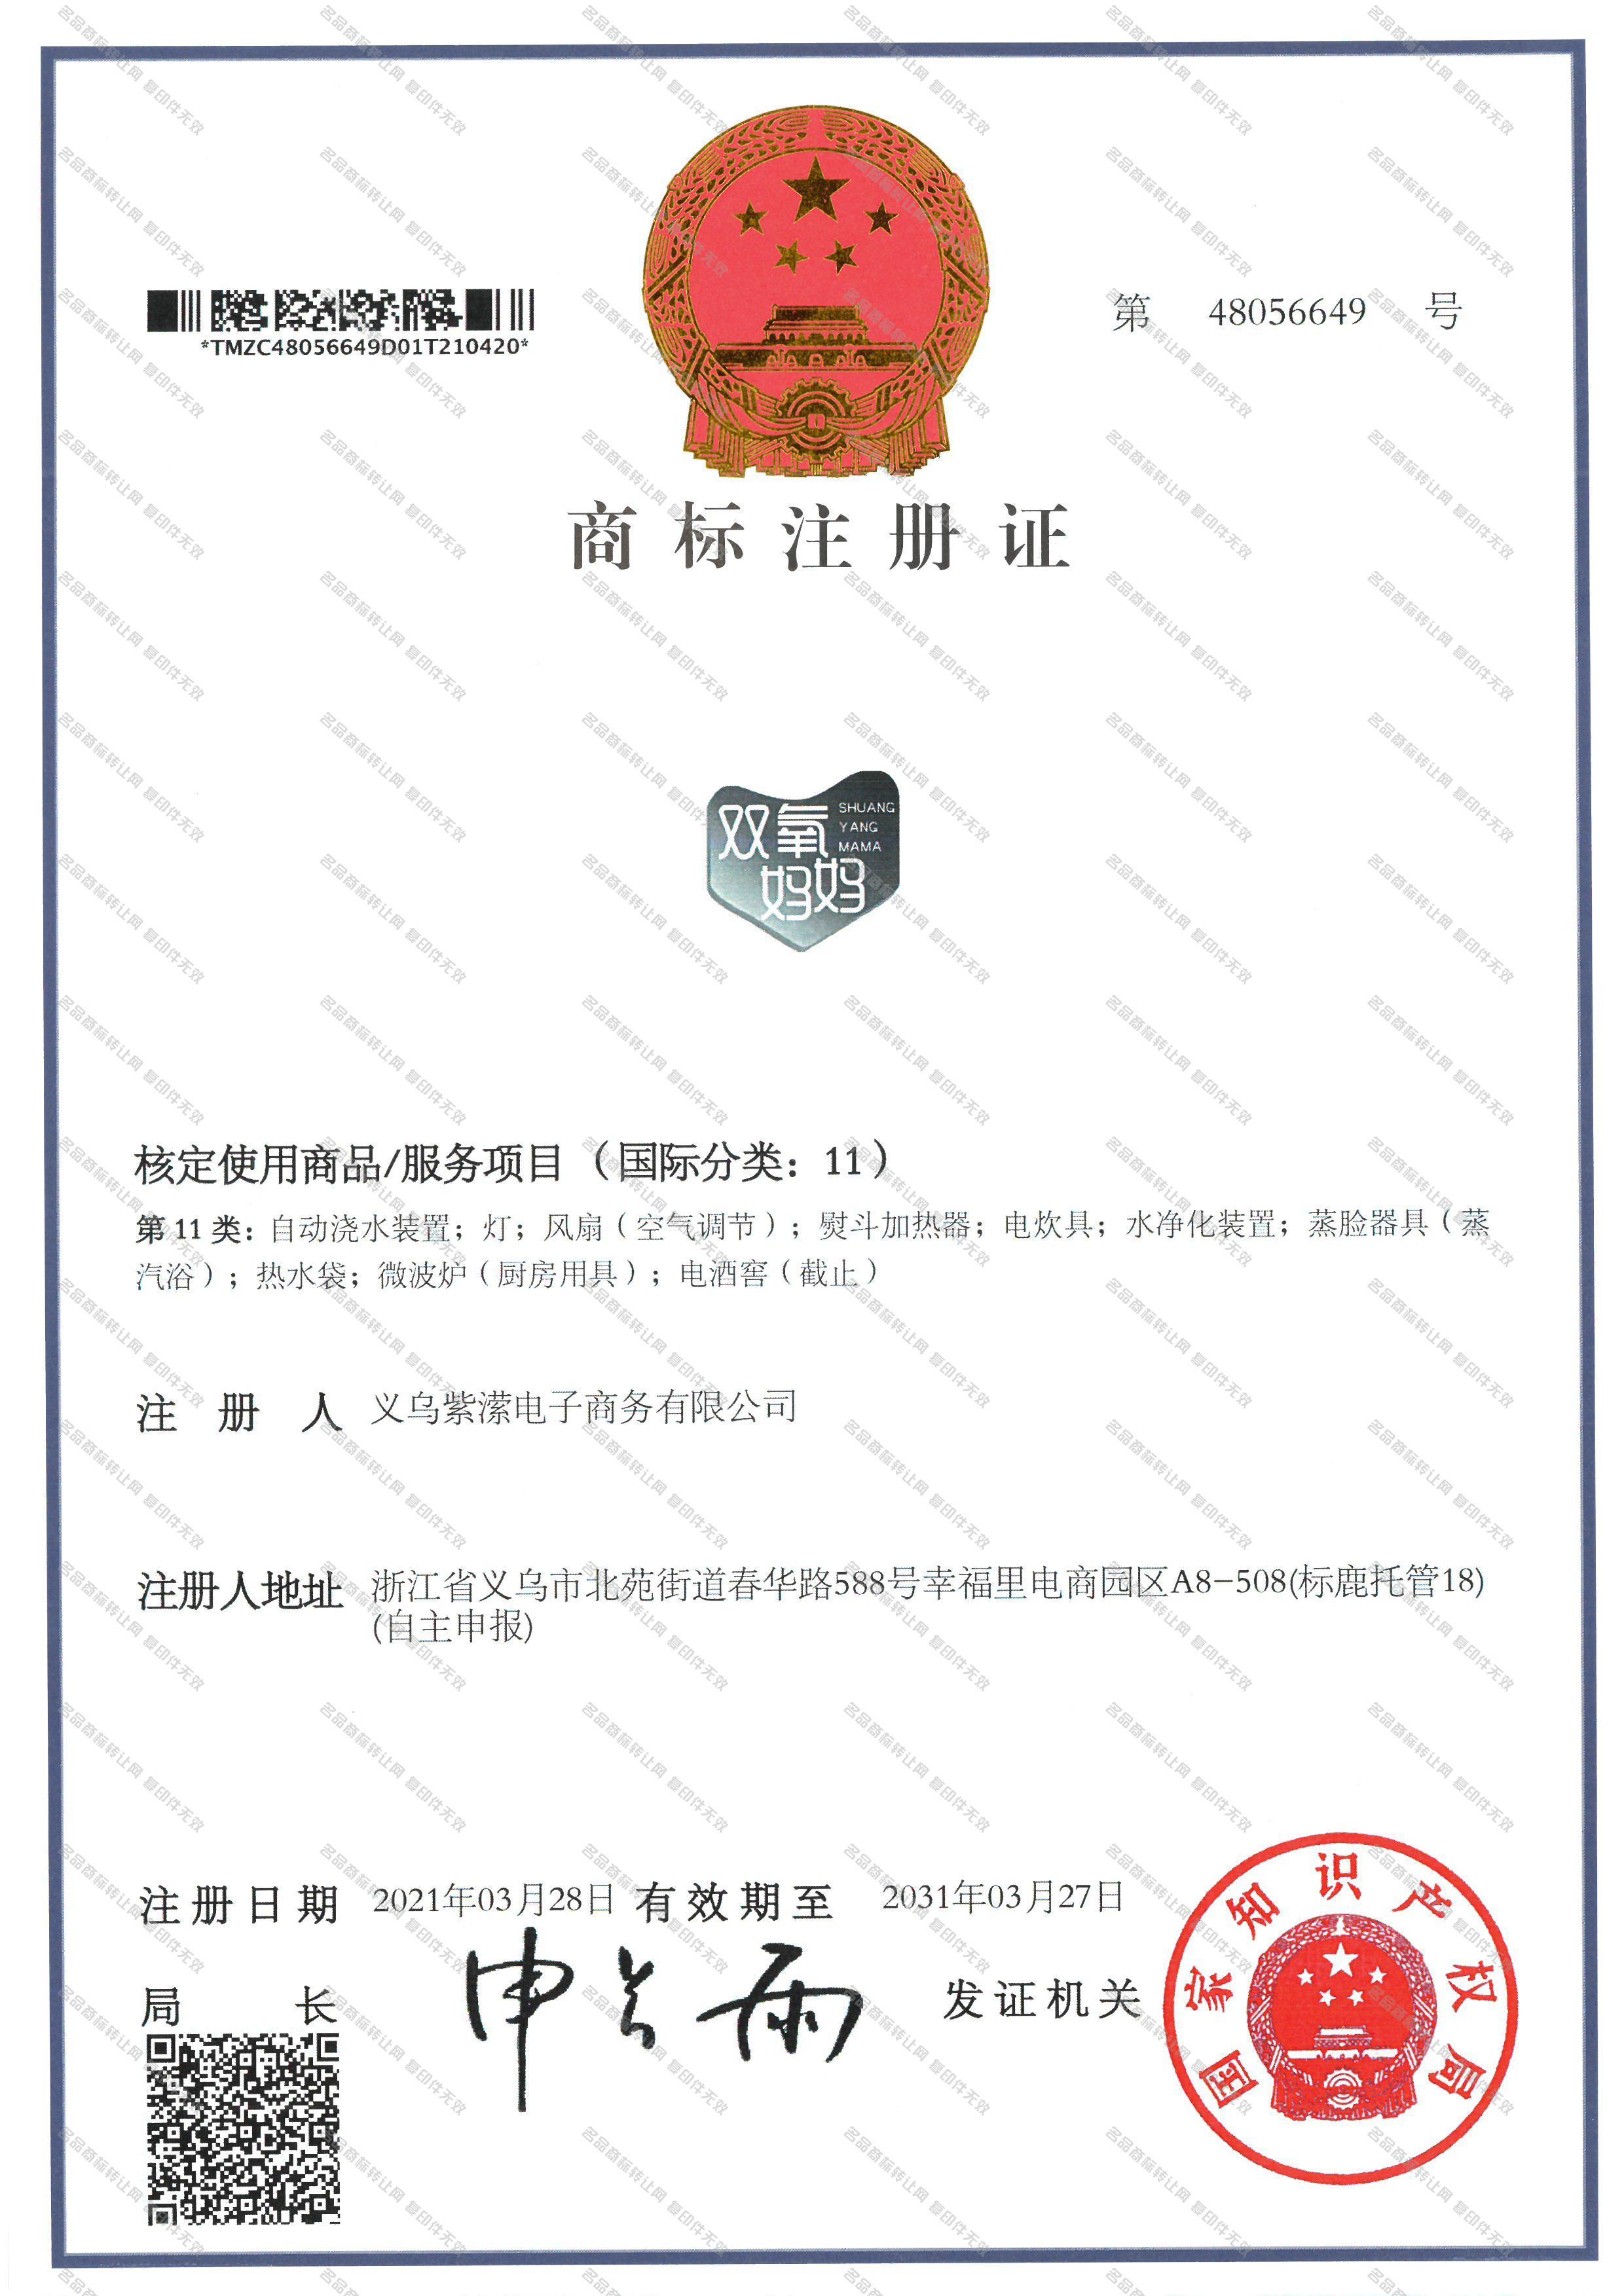 双氧妈妈;SHUANGYANGMAMA注册证